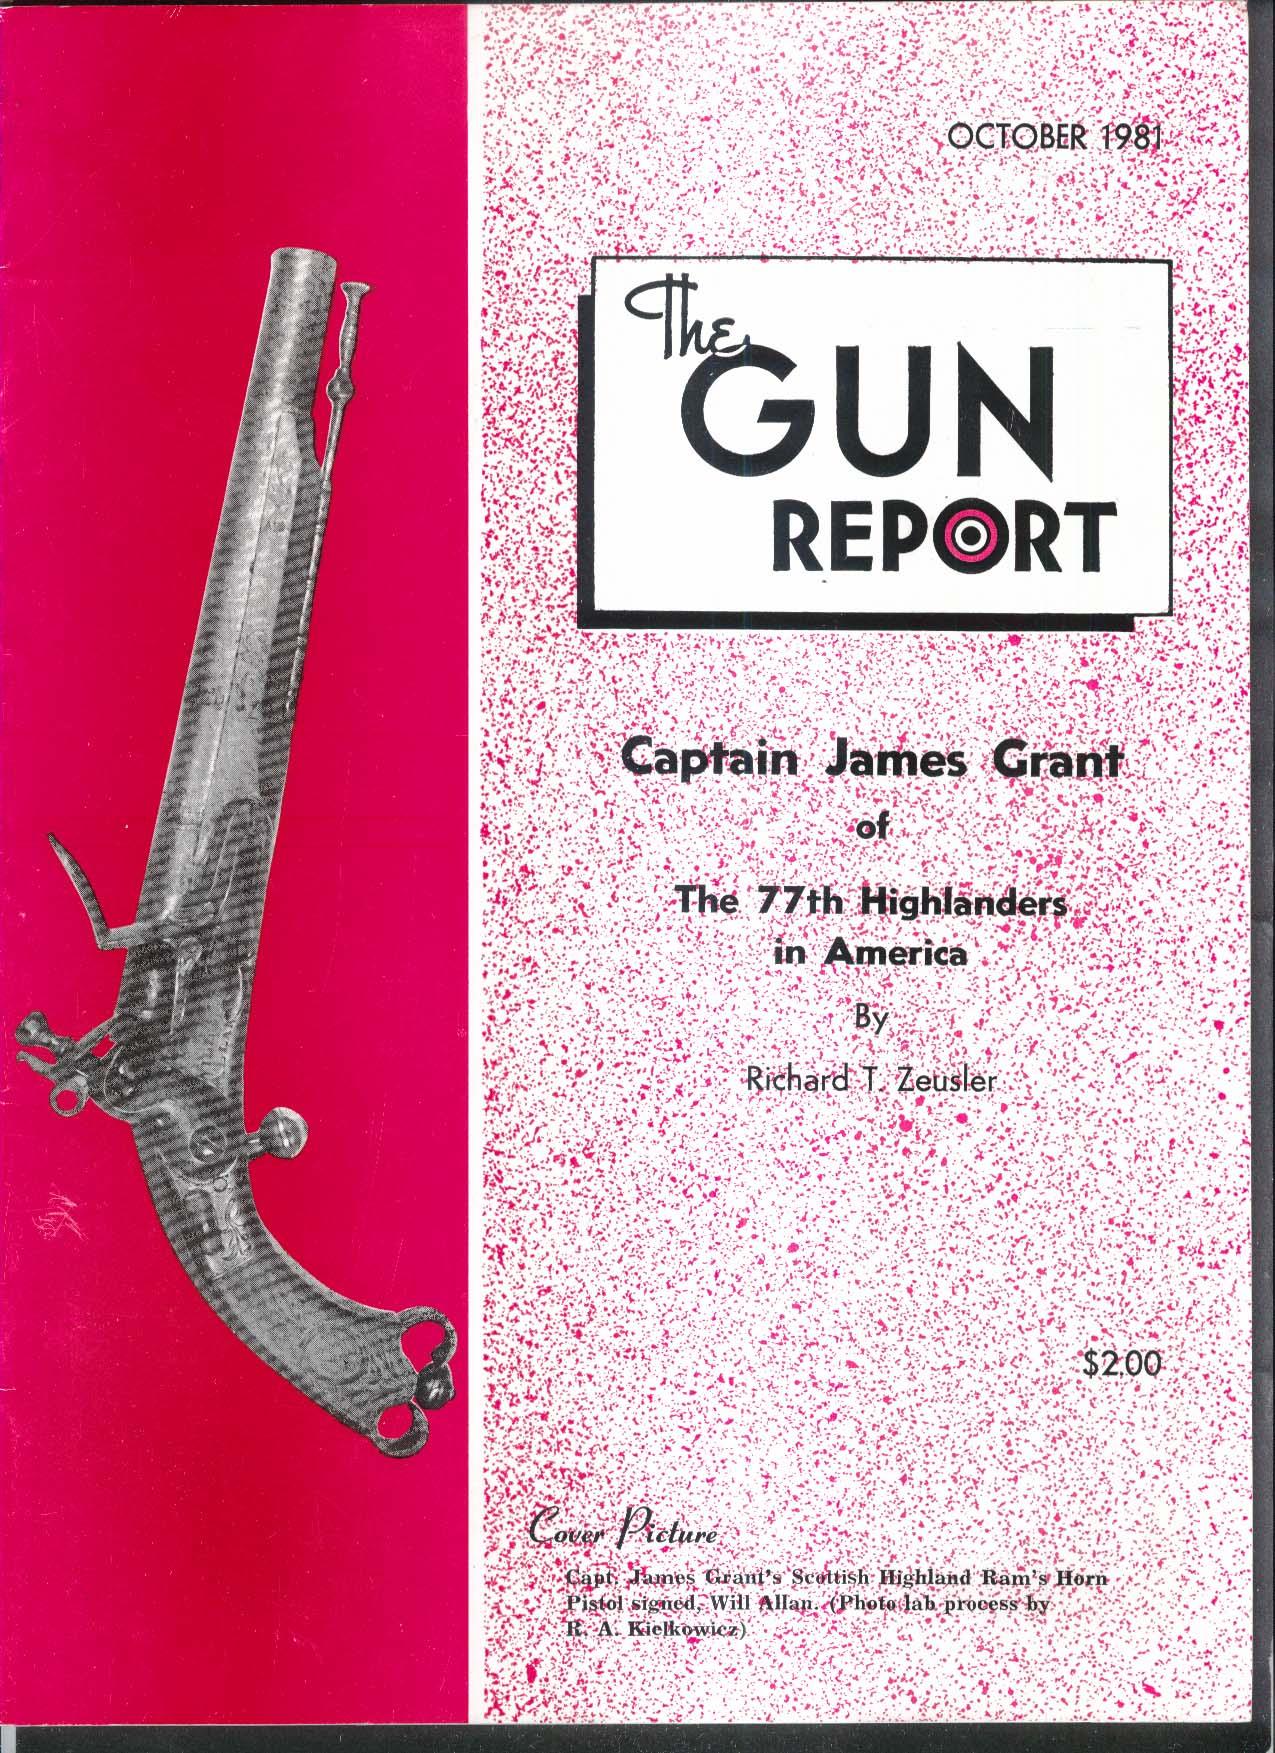 GUN REPORT Captain James Grant Highlanders Pistol Finnish Military 10 1981